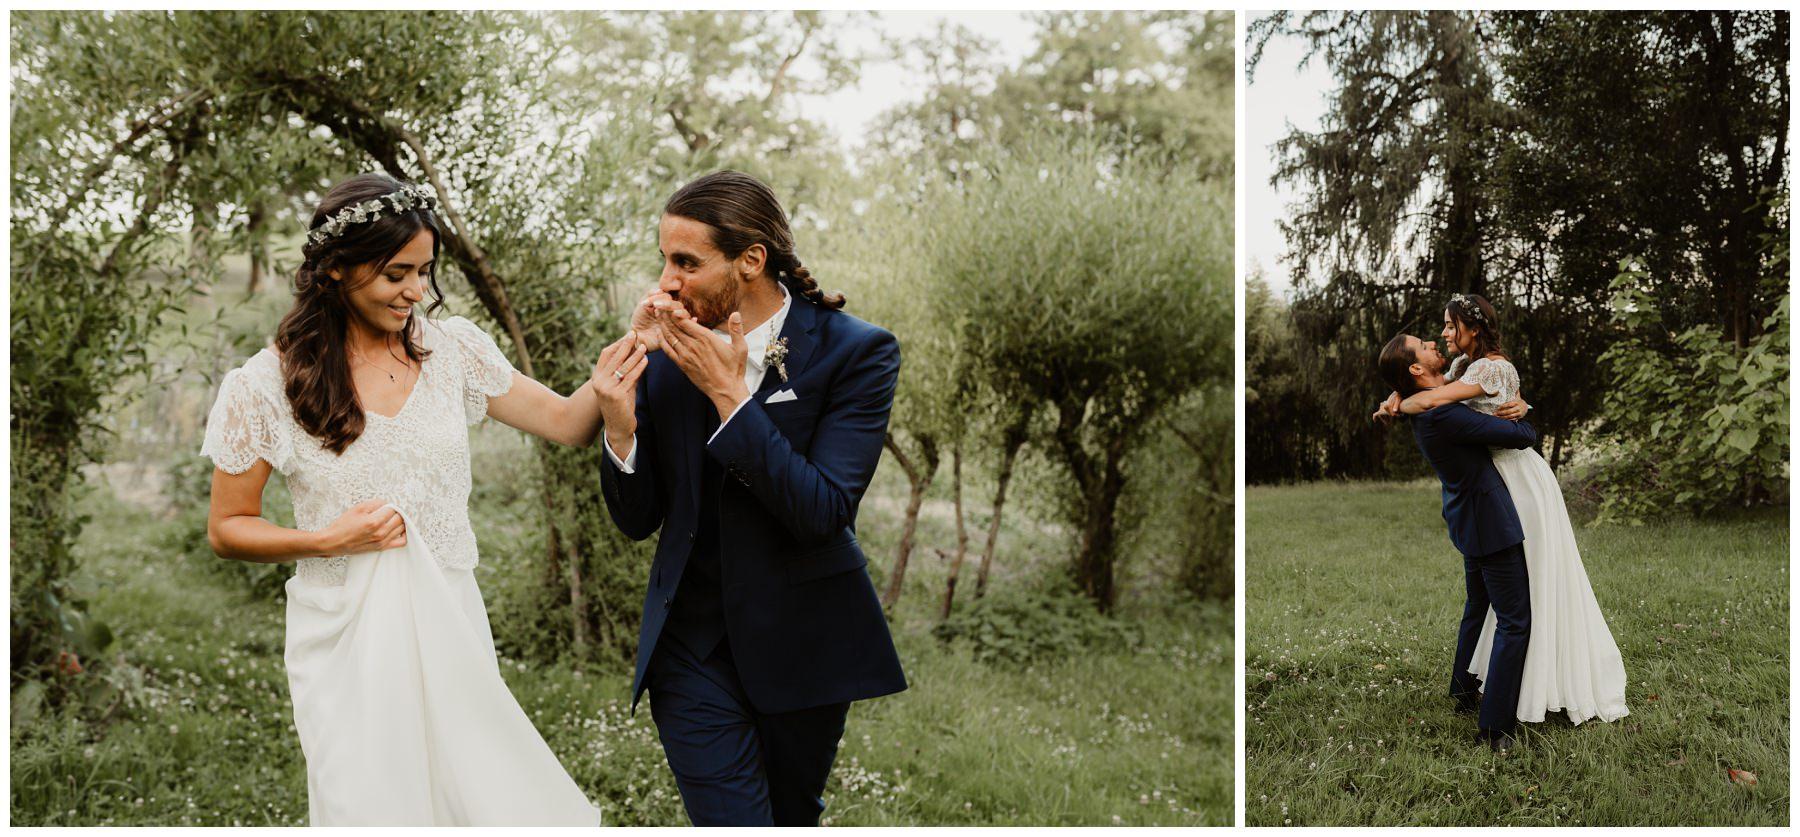 mariage nature bohème